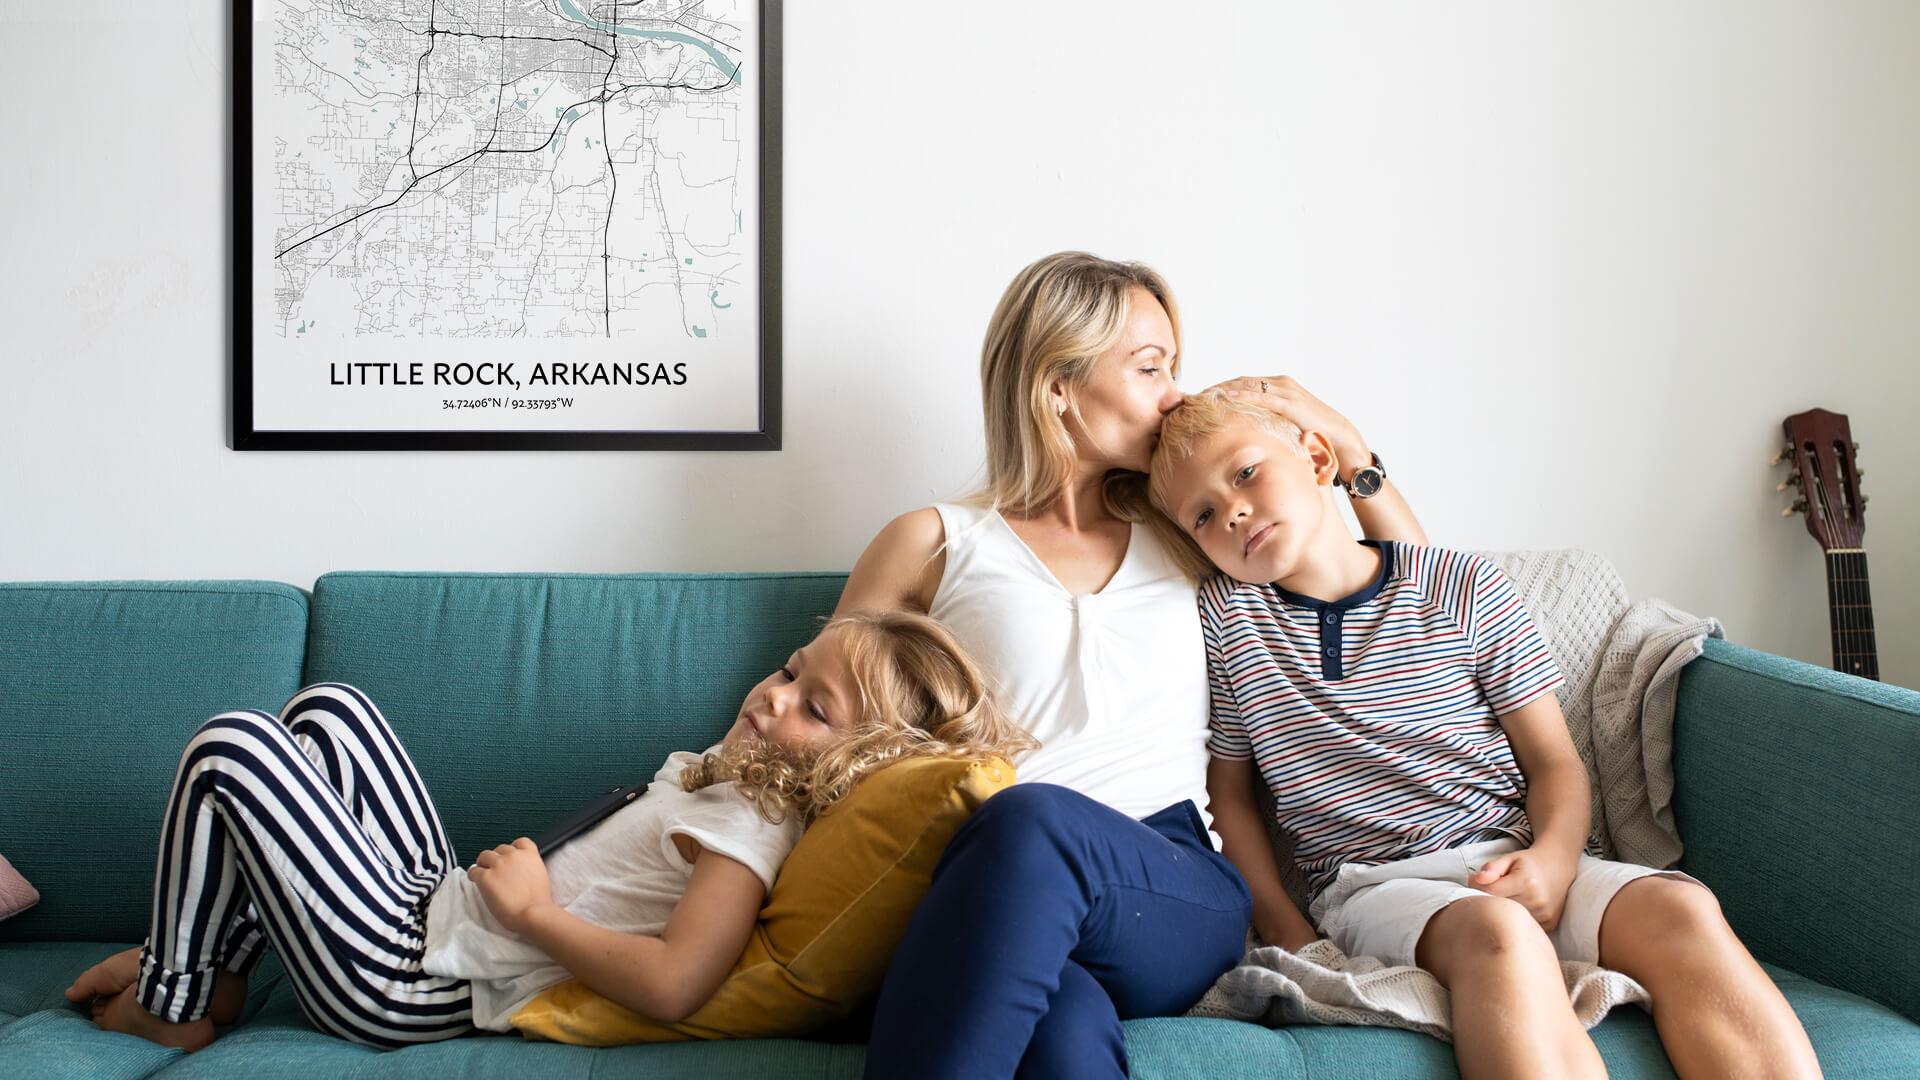 Little Rock map poster